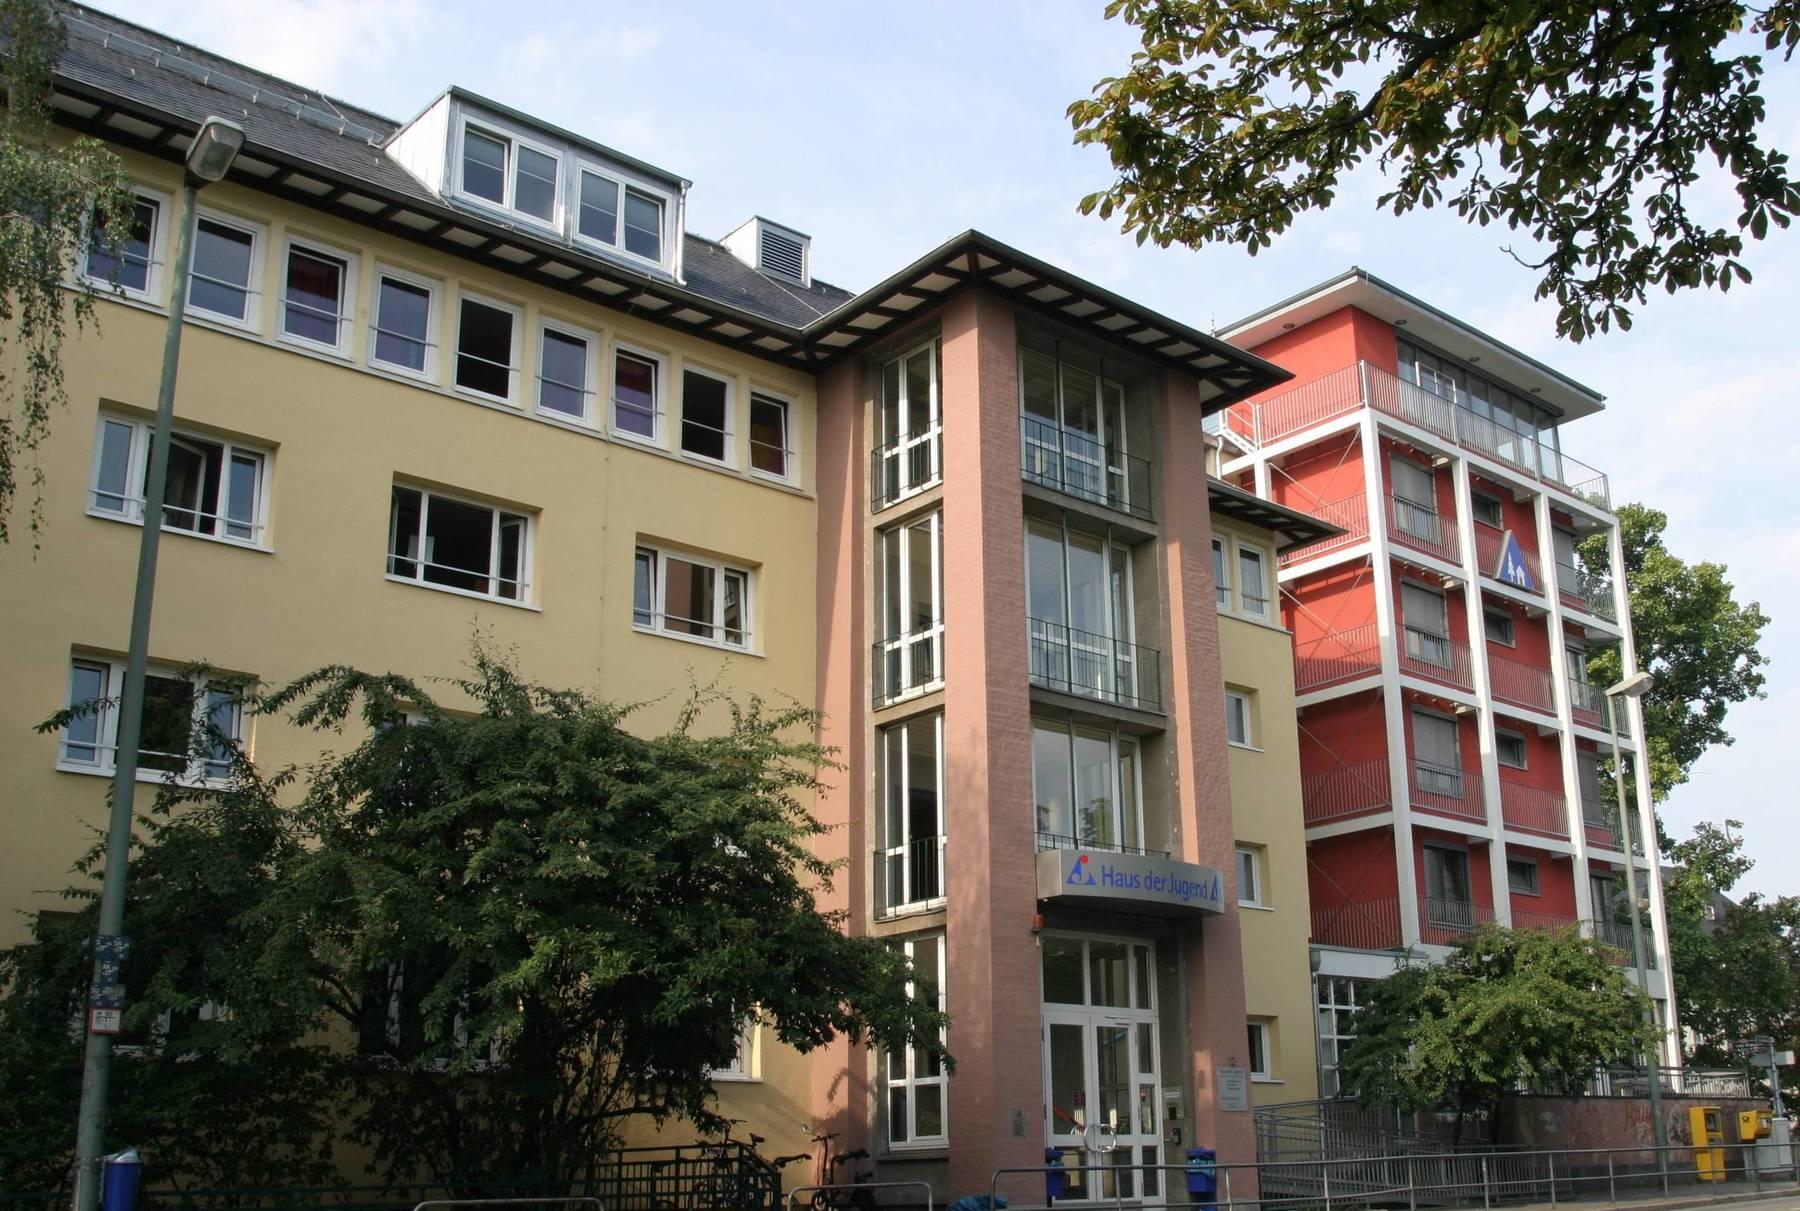 frankfurt_jh_eing1